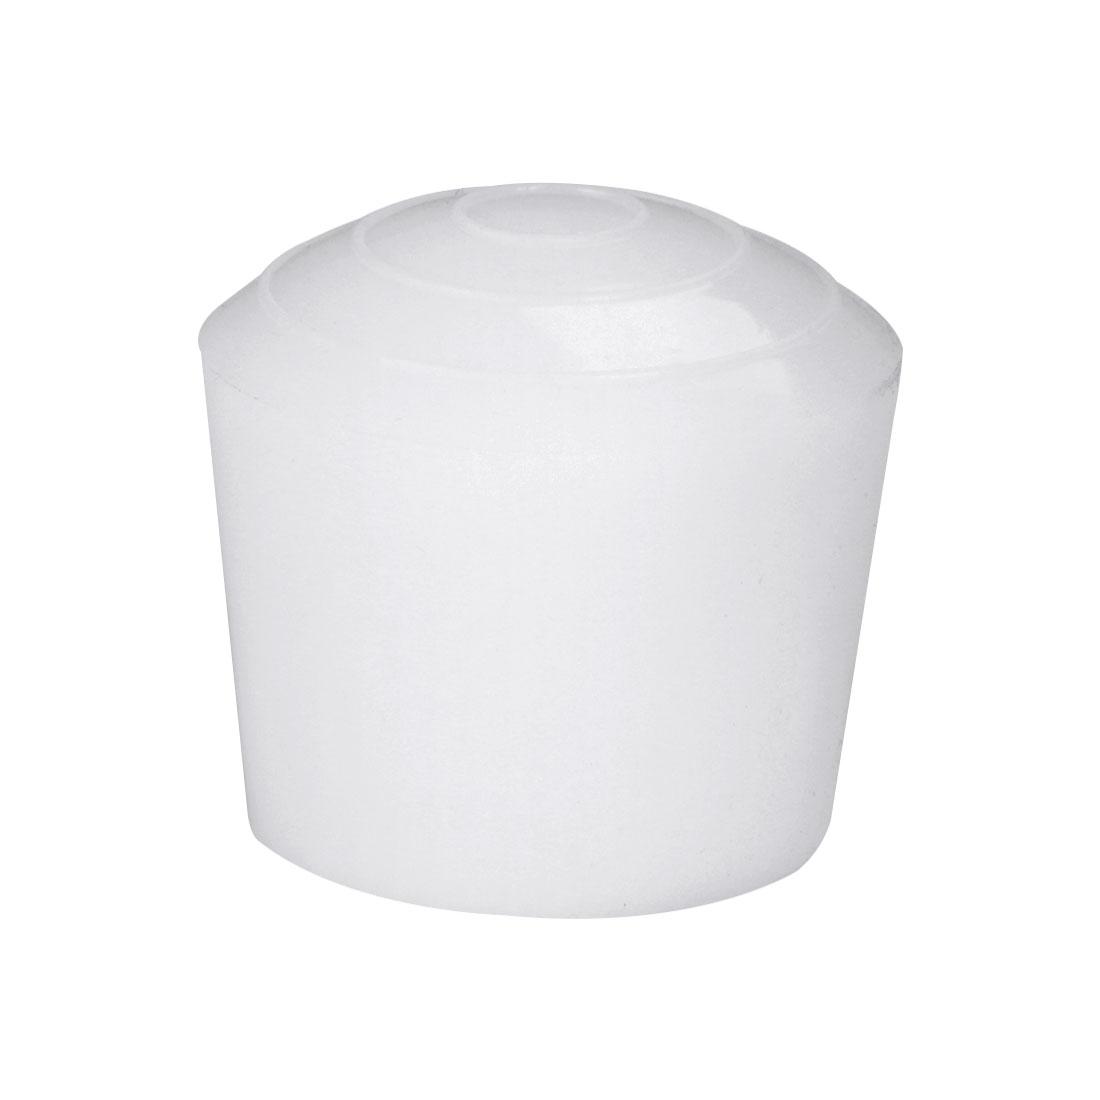 "Leg Caps Anti Slip 28mm/1 1/10"" Table Chair Feet Cover Floor Protector"